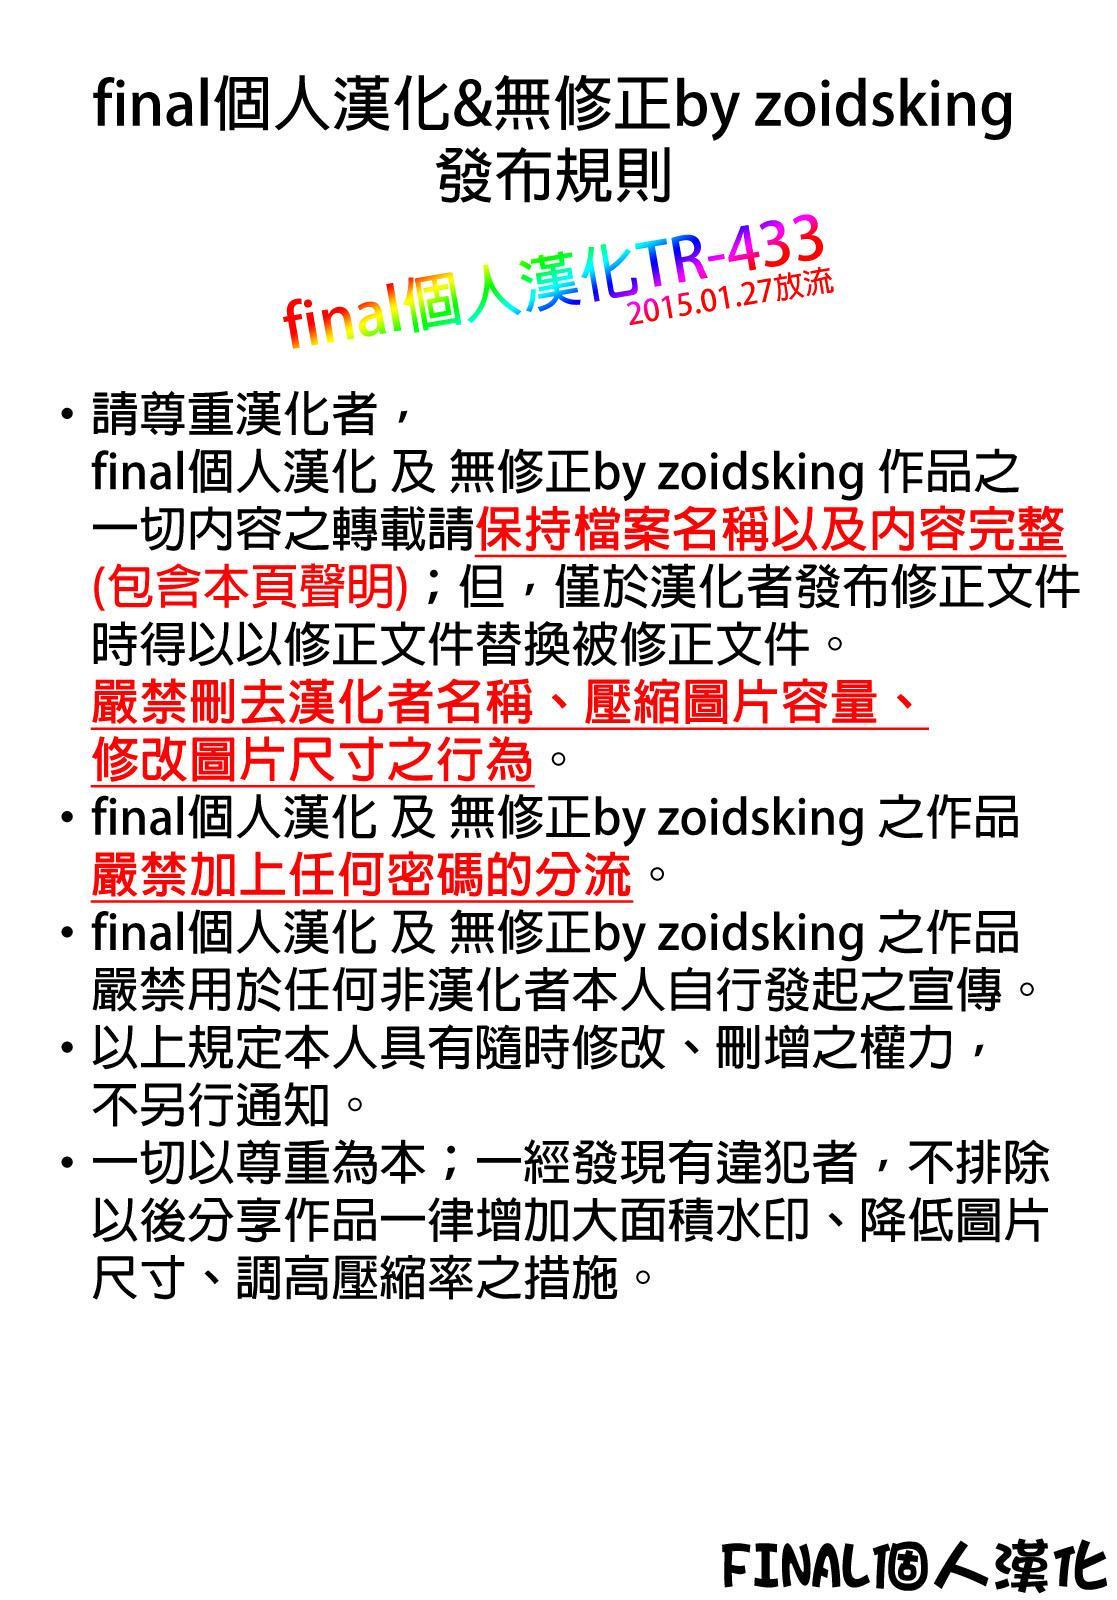 (C87) [TEX-MEX (Red Bear)] SSS Sinon-chan Sinon-chan Sukisuki (Sword Art Online) [Chinese] [final個人漢化] 25